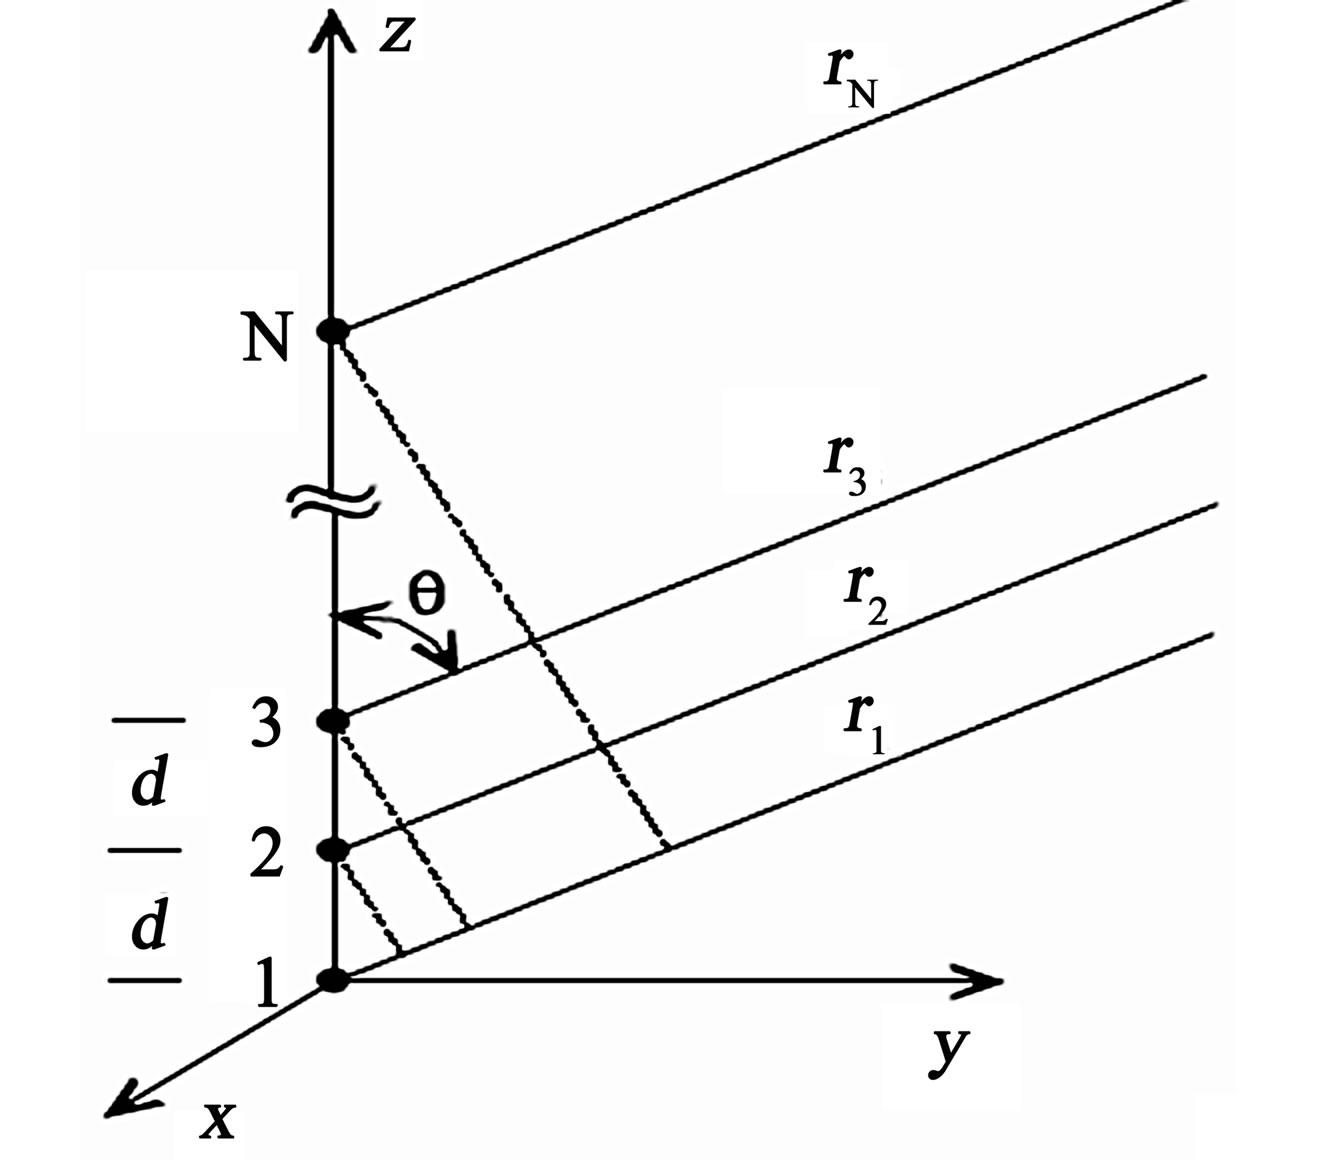 Comparison of Circular Sector and Rectangular Patch Antenna Arrays